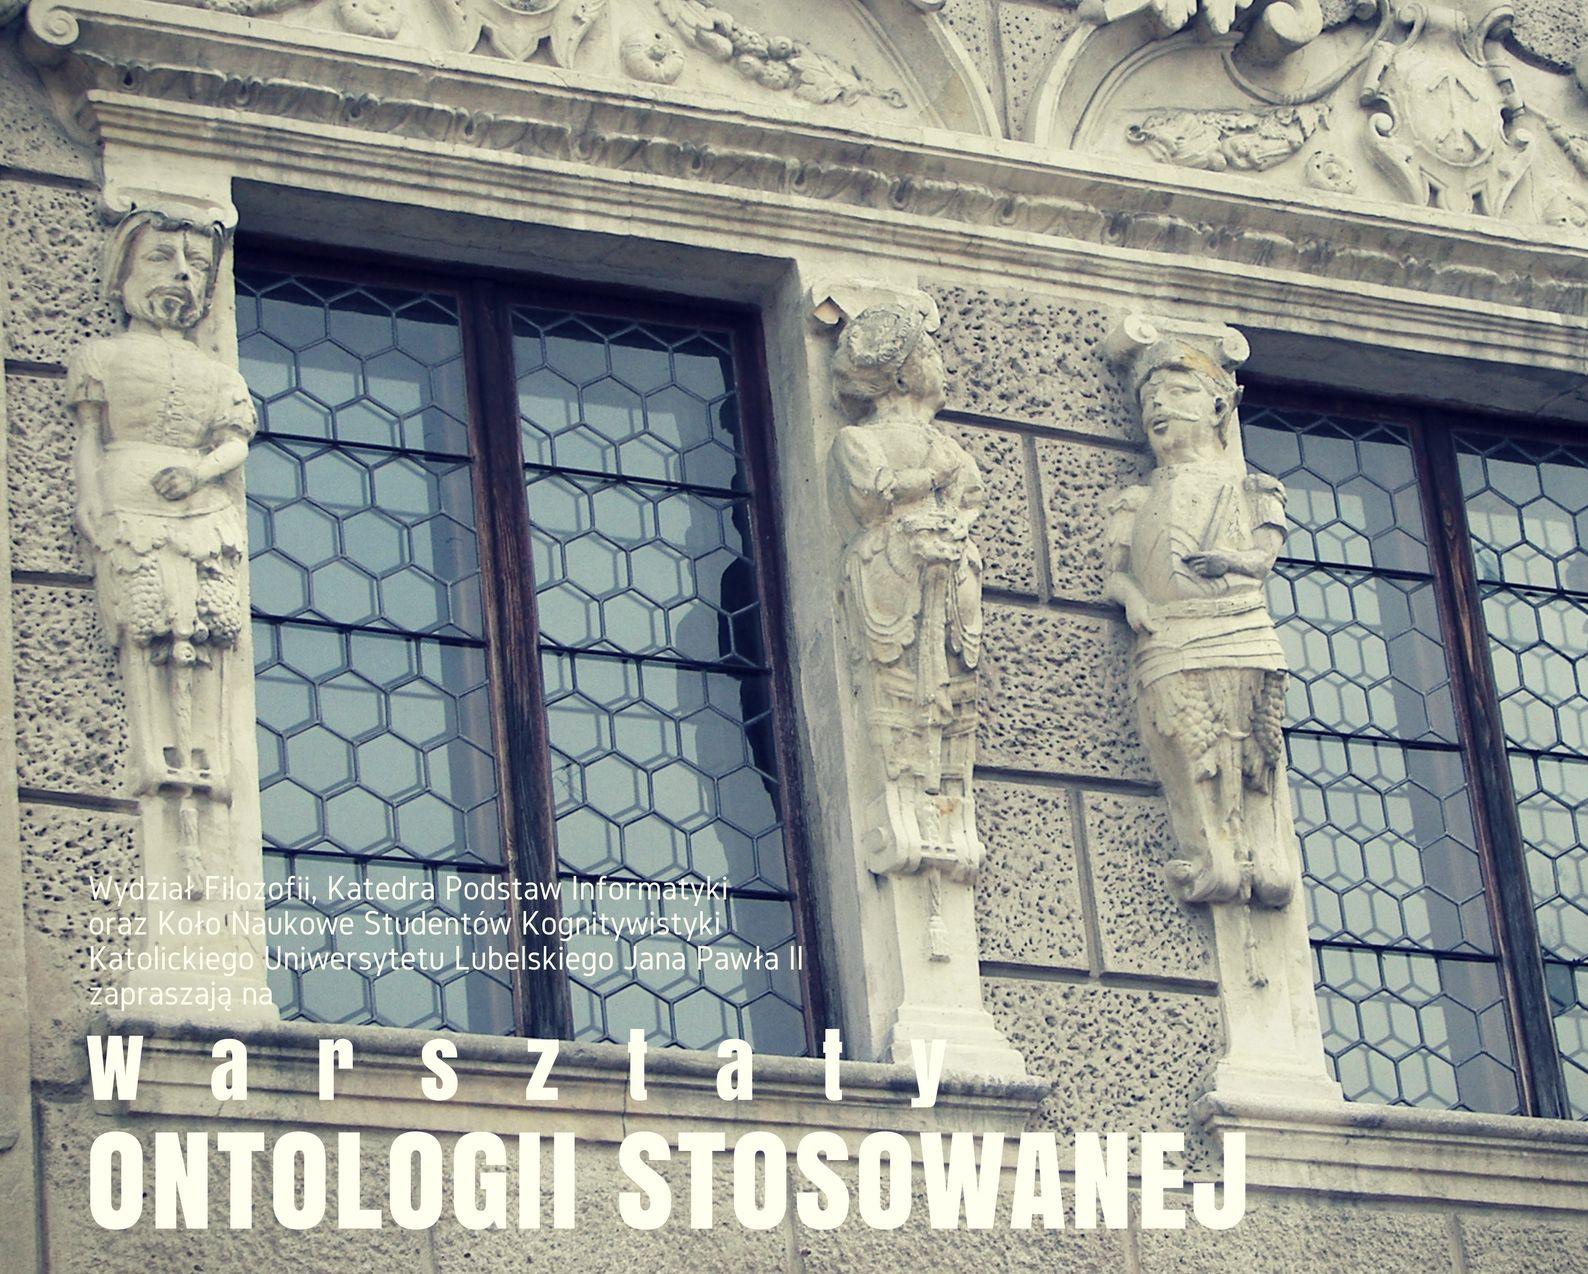 warsztaty ontologii